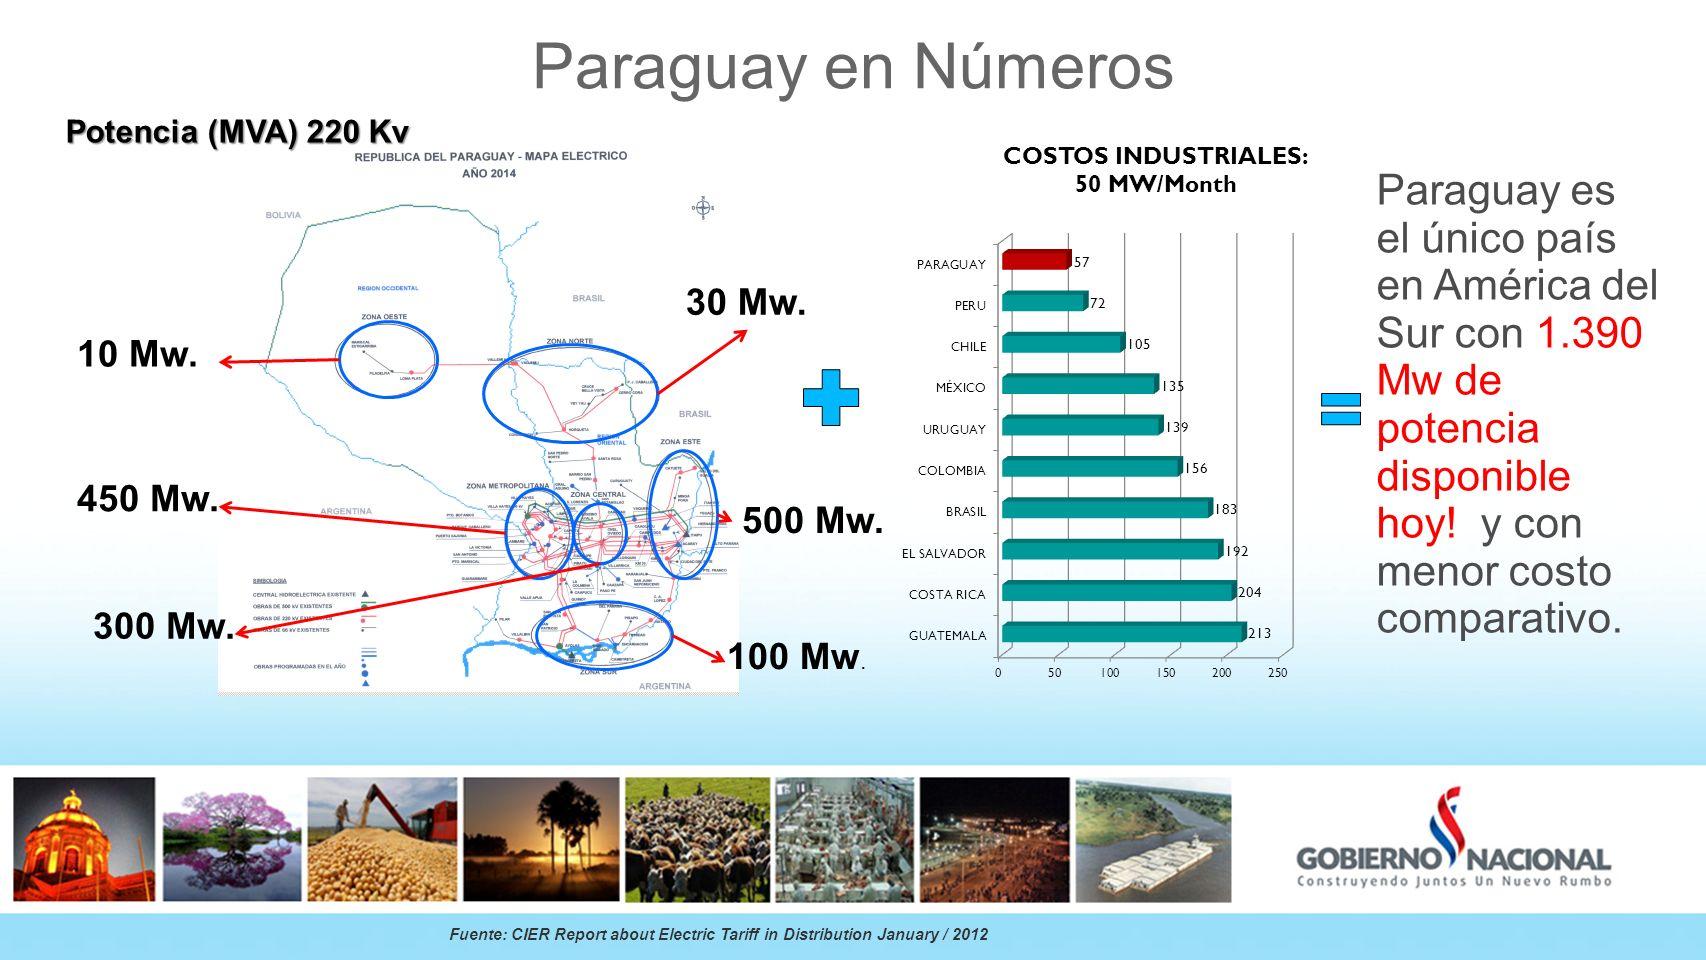 Paraguay en Números Potencia (MVA) 220 Kv.